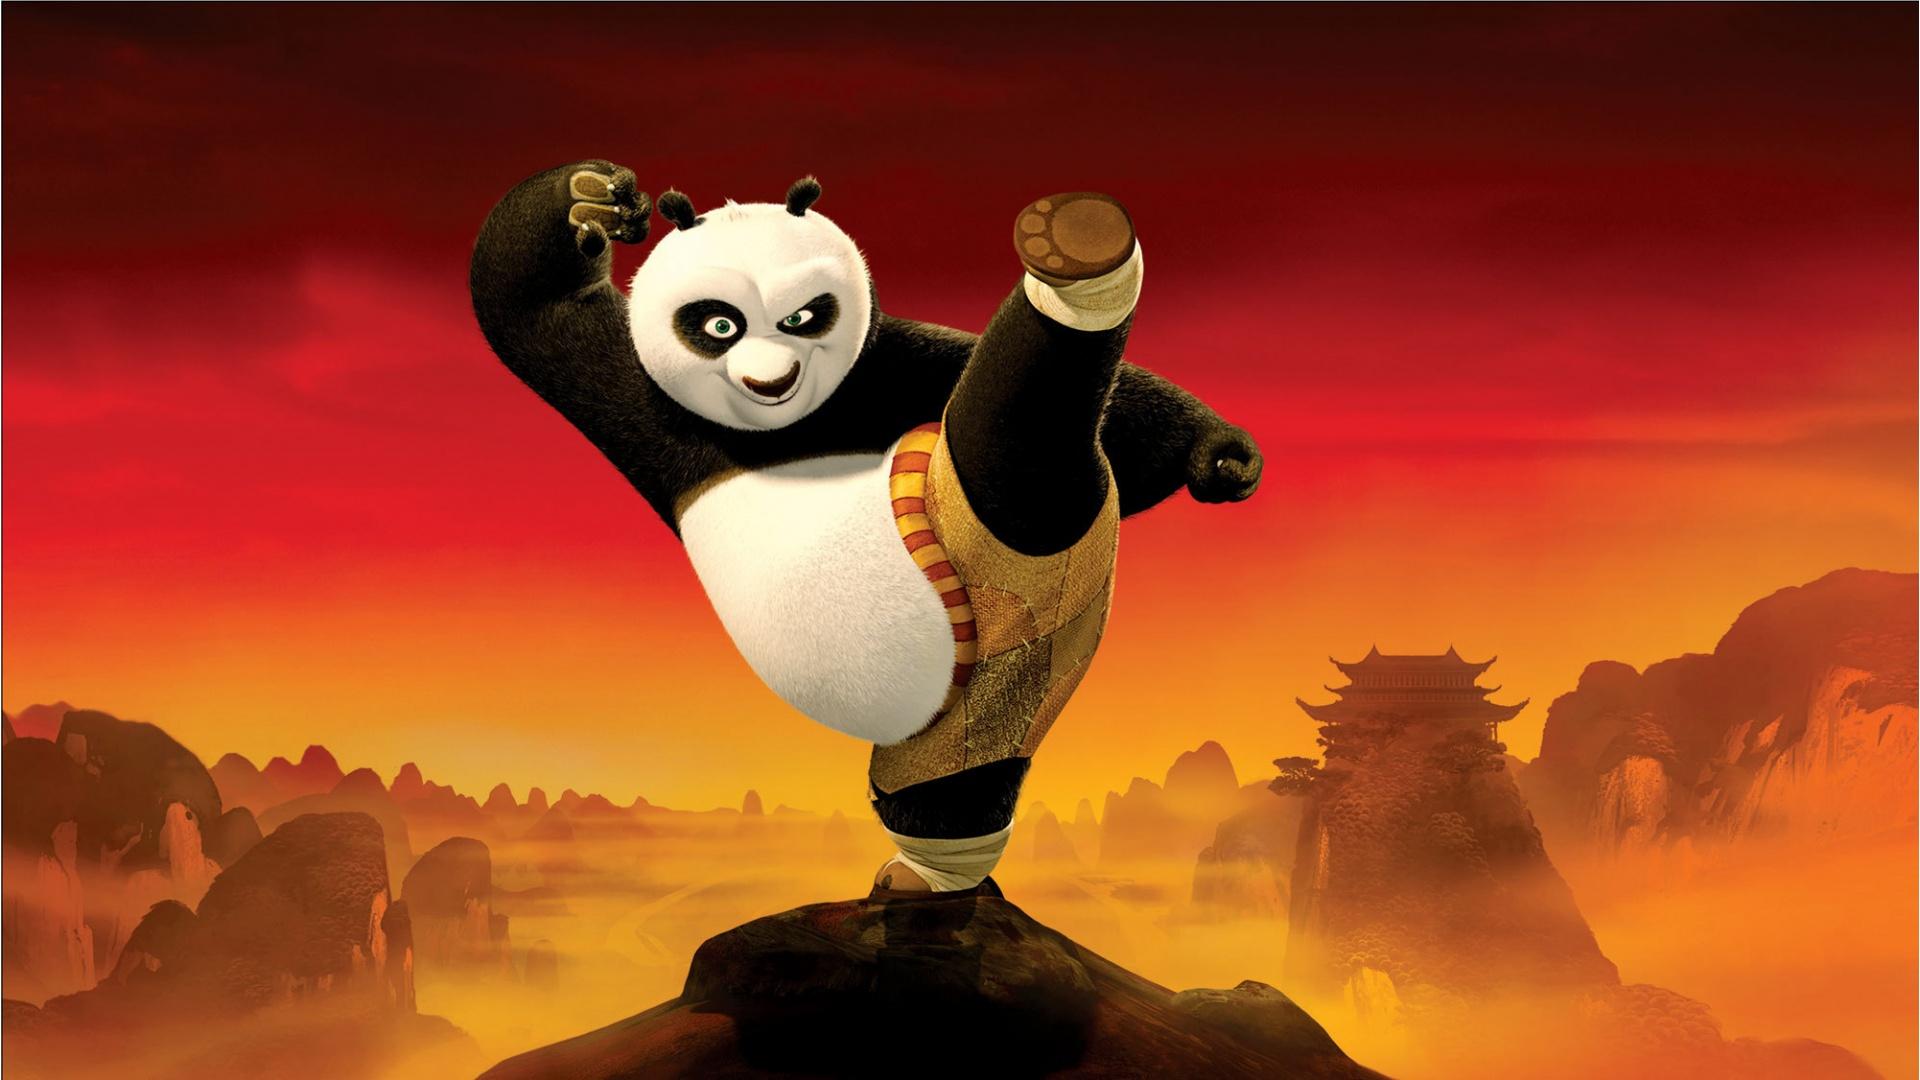 Kung Fu Panda 3 - High Definition Wallpapers - HD wallpapers